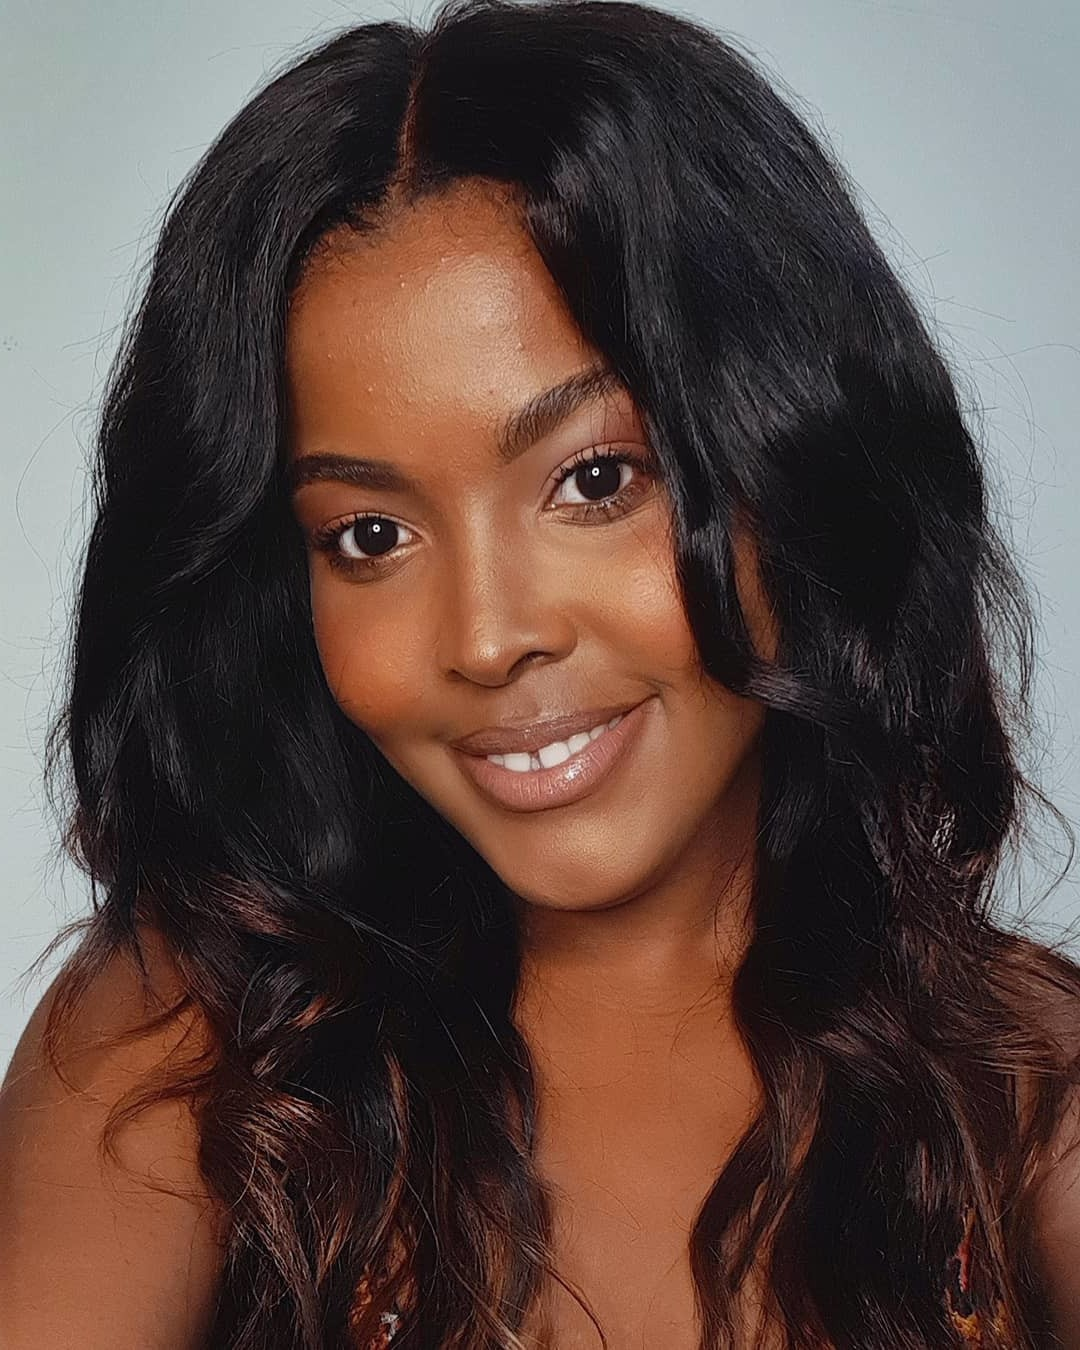 Medium-Length Dark Black Hairstyle